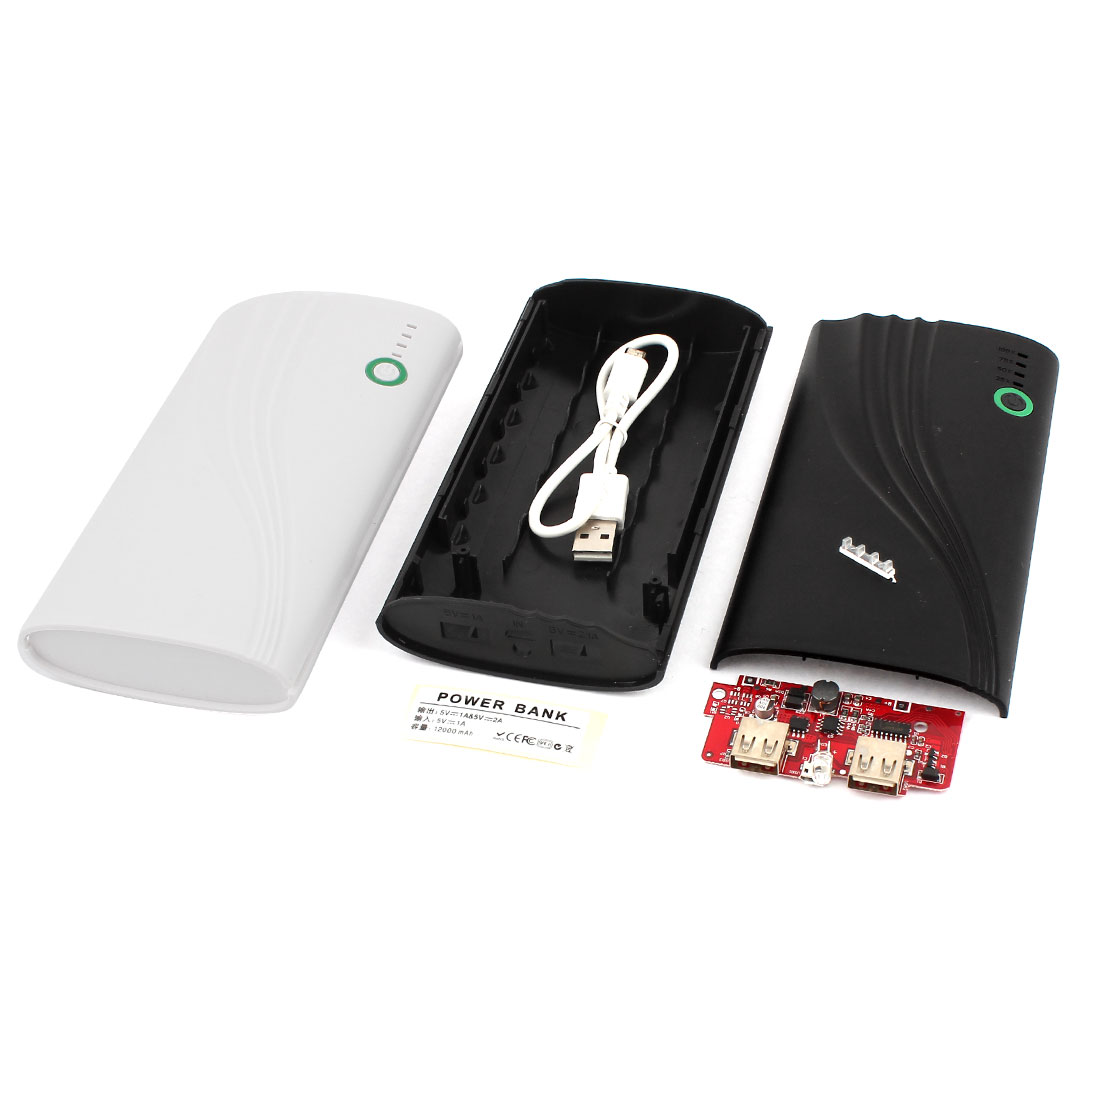 2 Pcs Black White Housing USB 5V 1A Power Bank 6x 18650 Battery Charger DIY Case